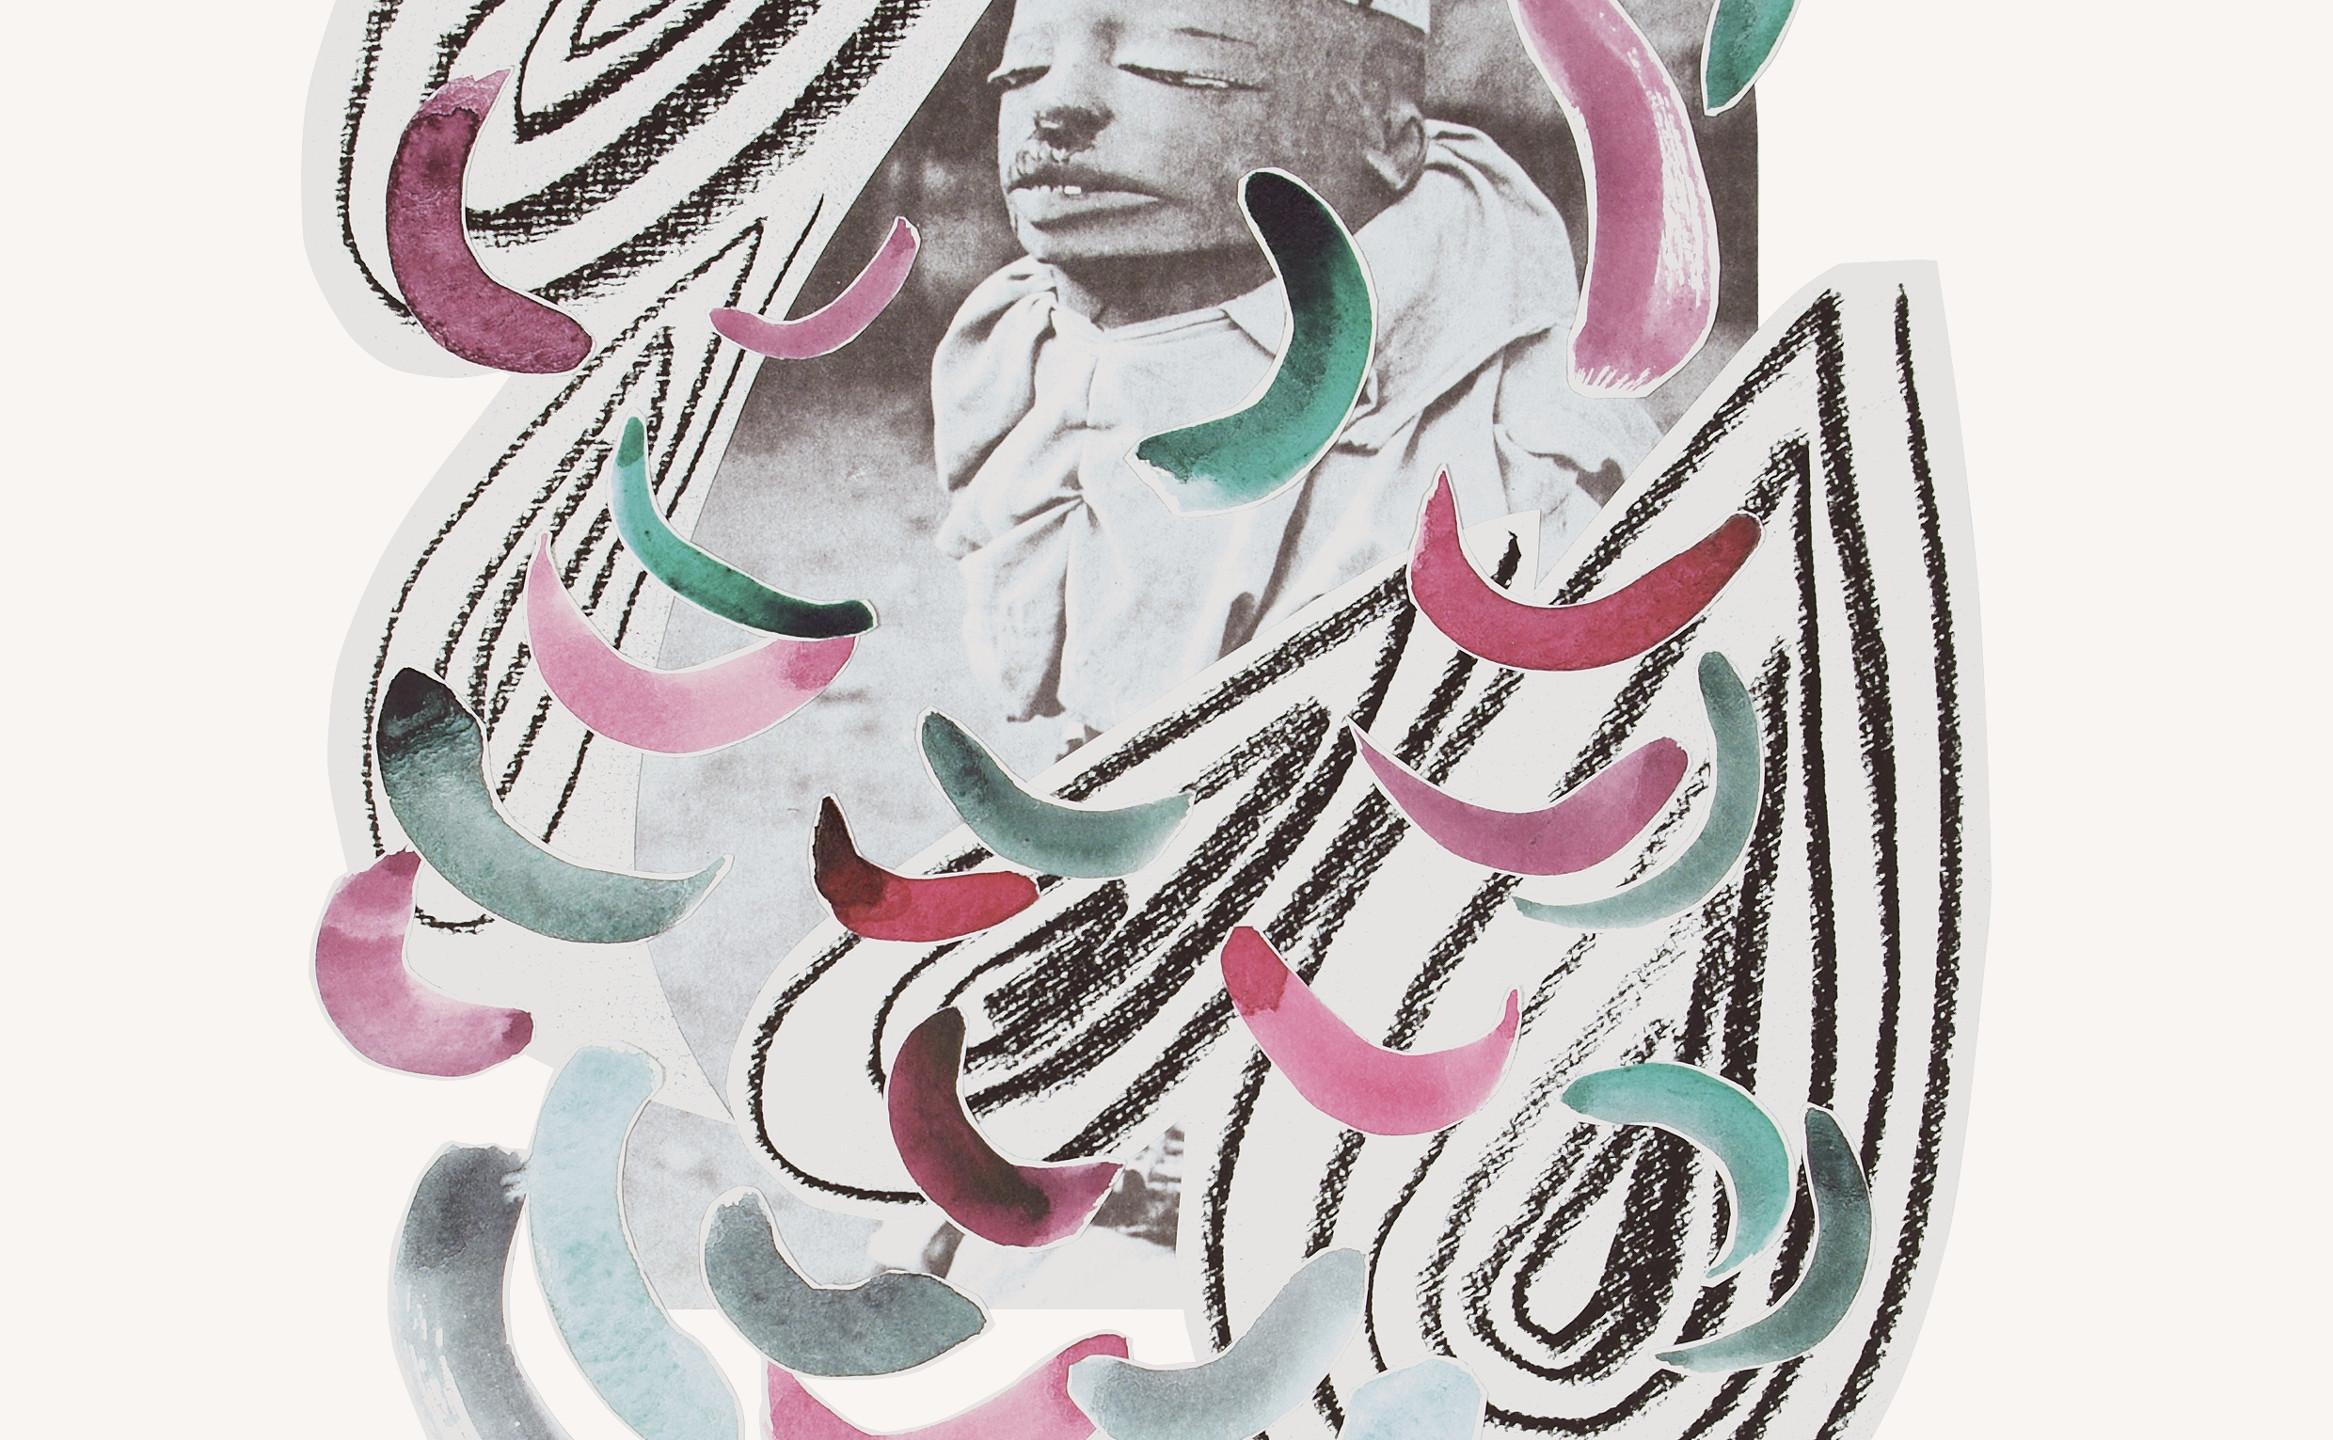 Redux, Larita Engelbrecht, Mixed Media Collage on Paper, 48 x 37cm (2333x3000)